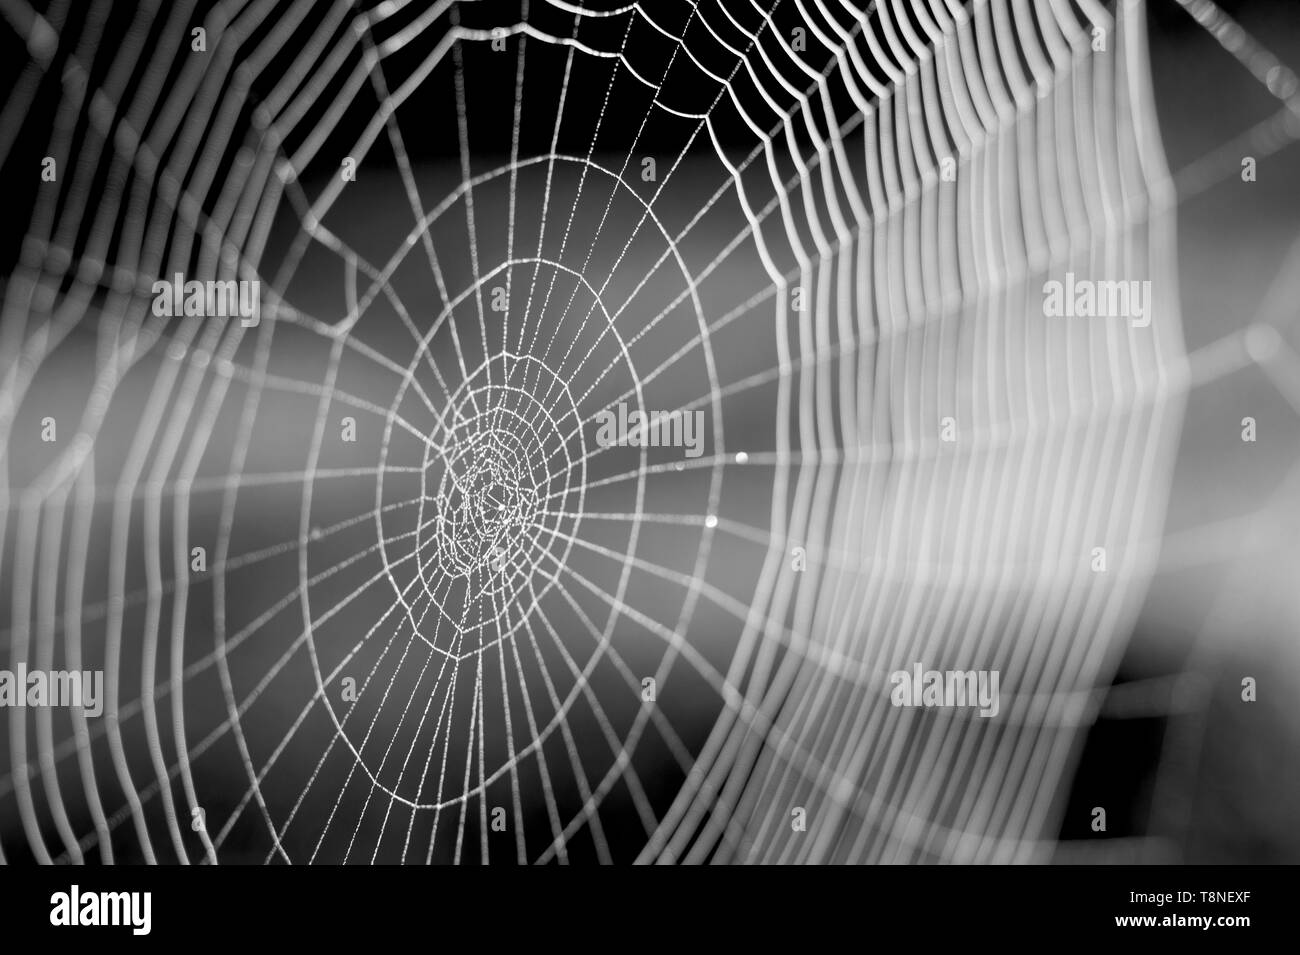 Web in Tautropfen close-up mit geringer Tiefenschärfe. Stockfoto